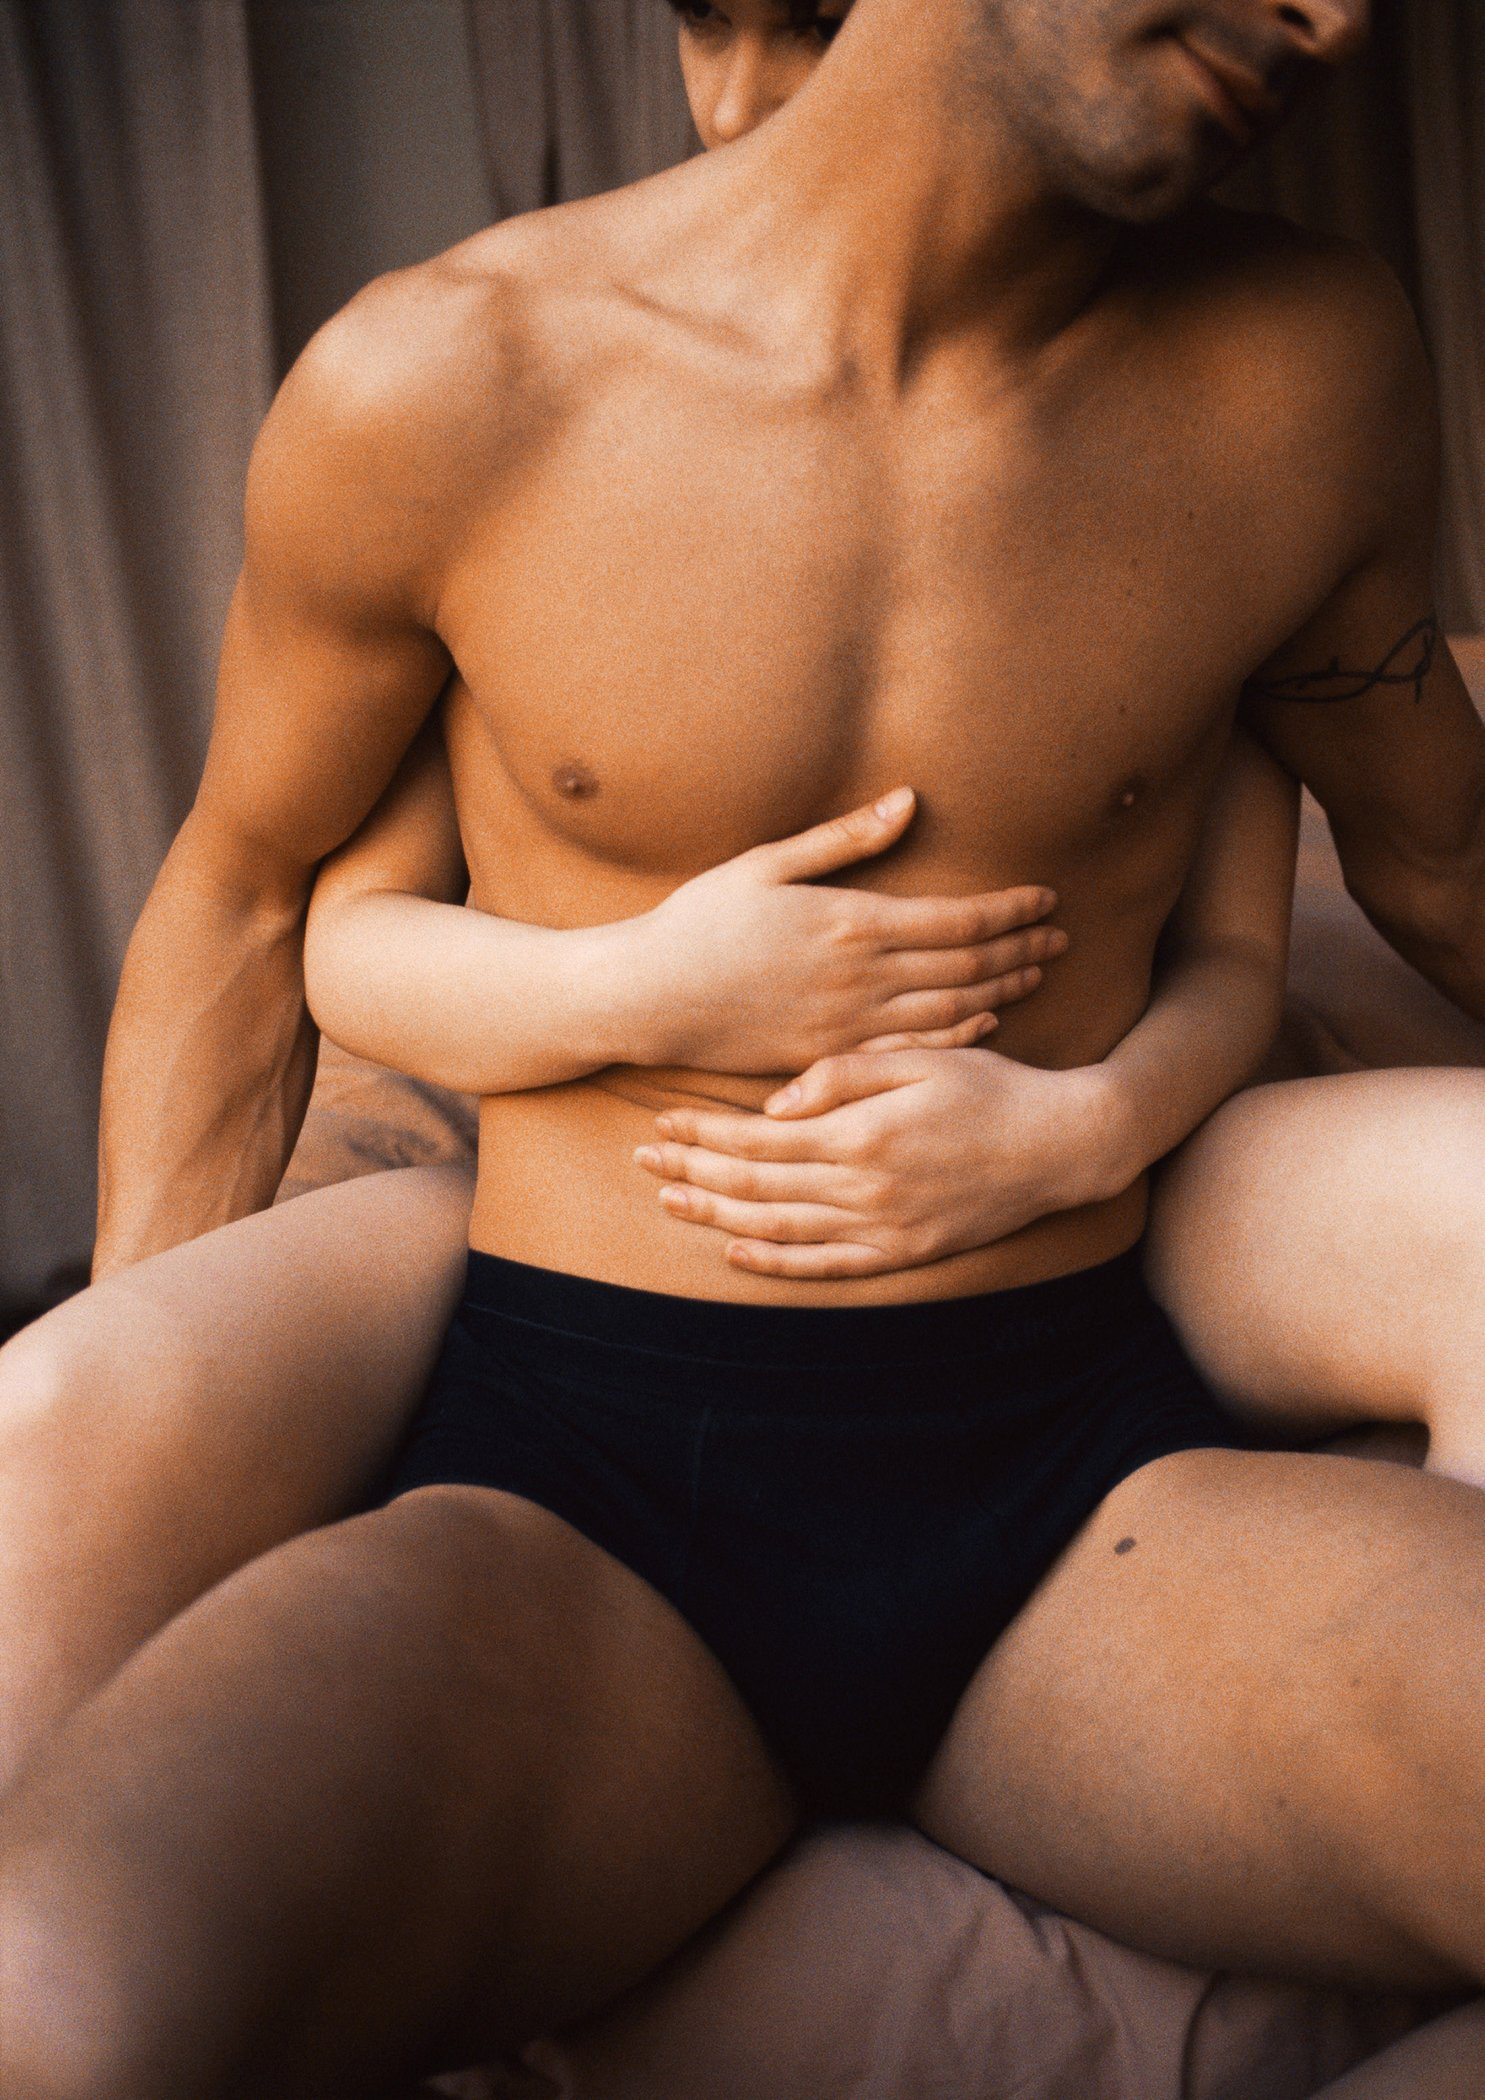 kvinders sexlyst varm sex